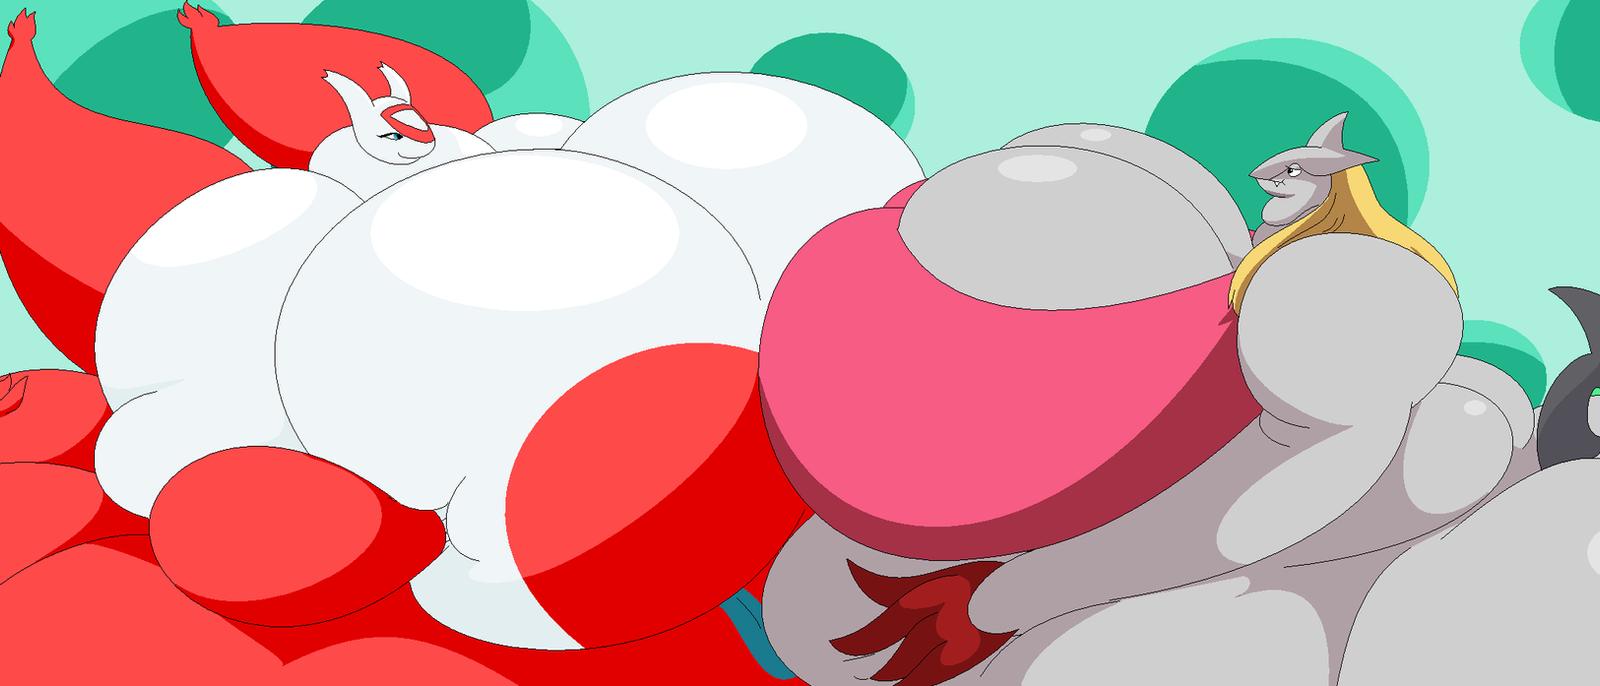 A large Cherry with plenty Margaret by Two-Ton-Neko